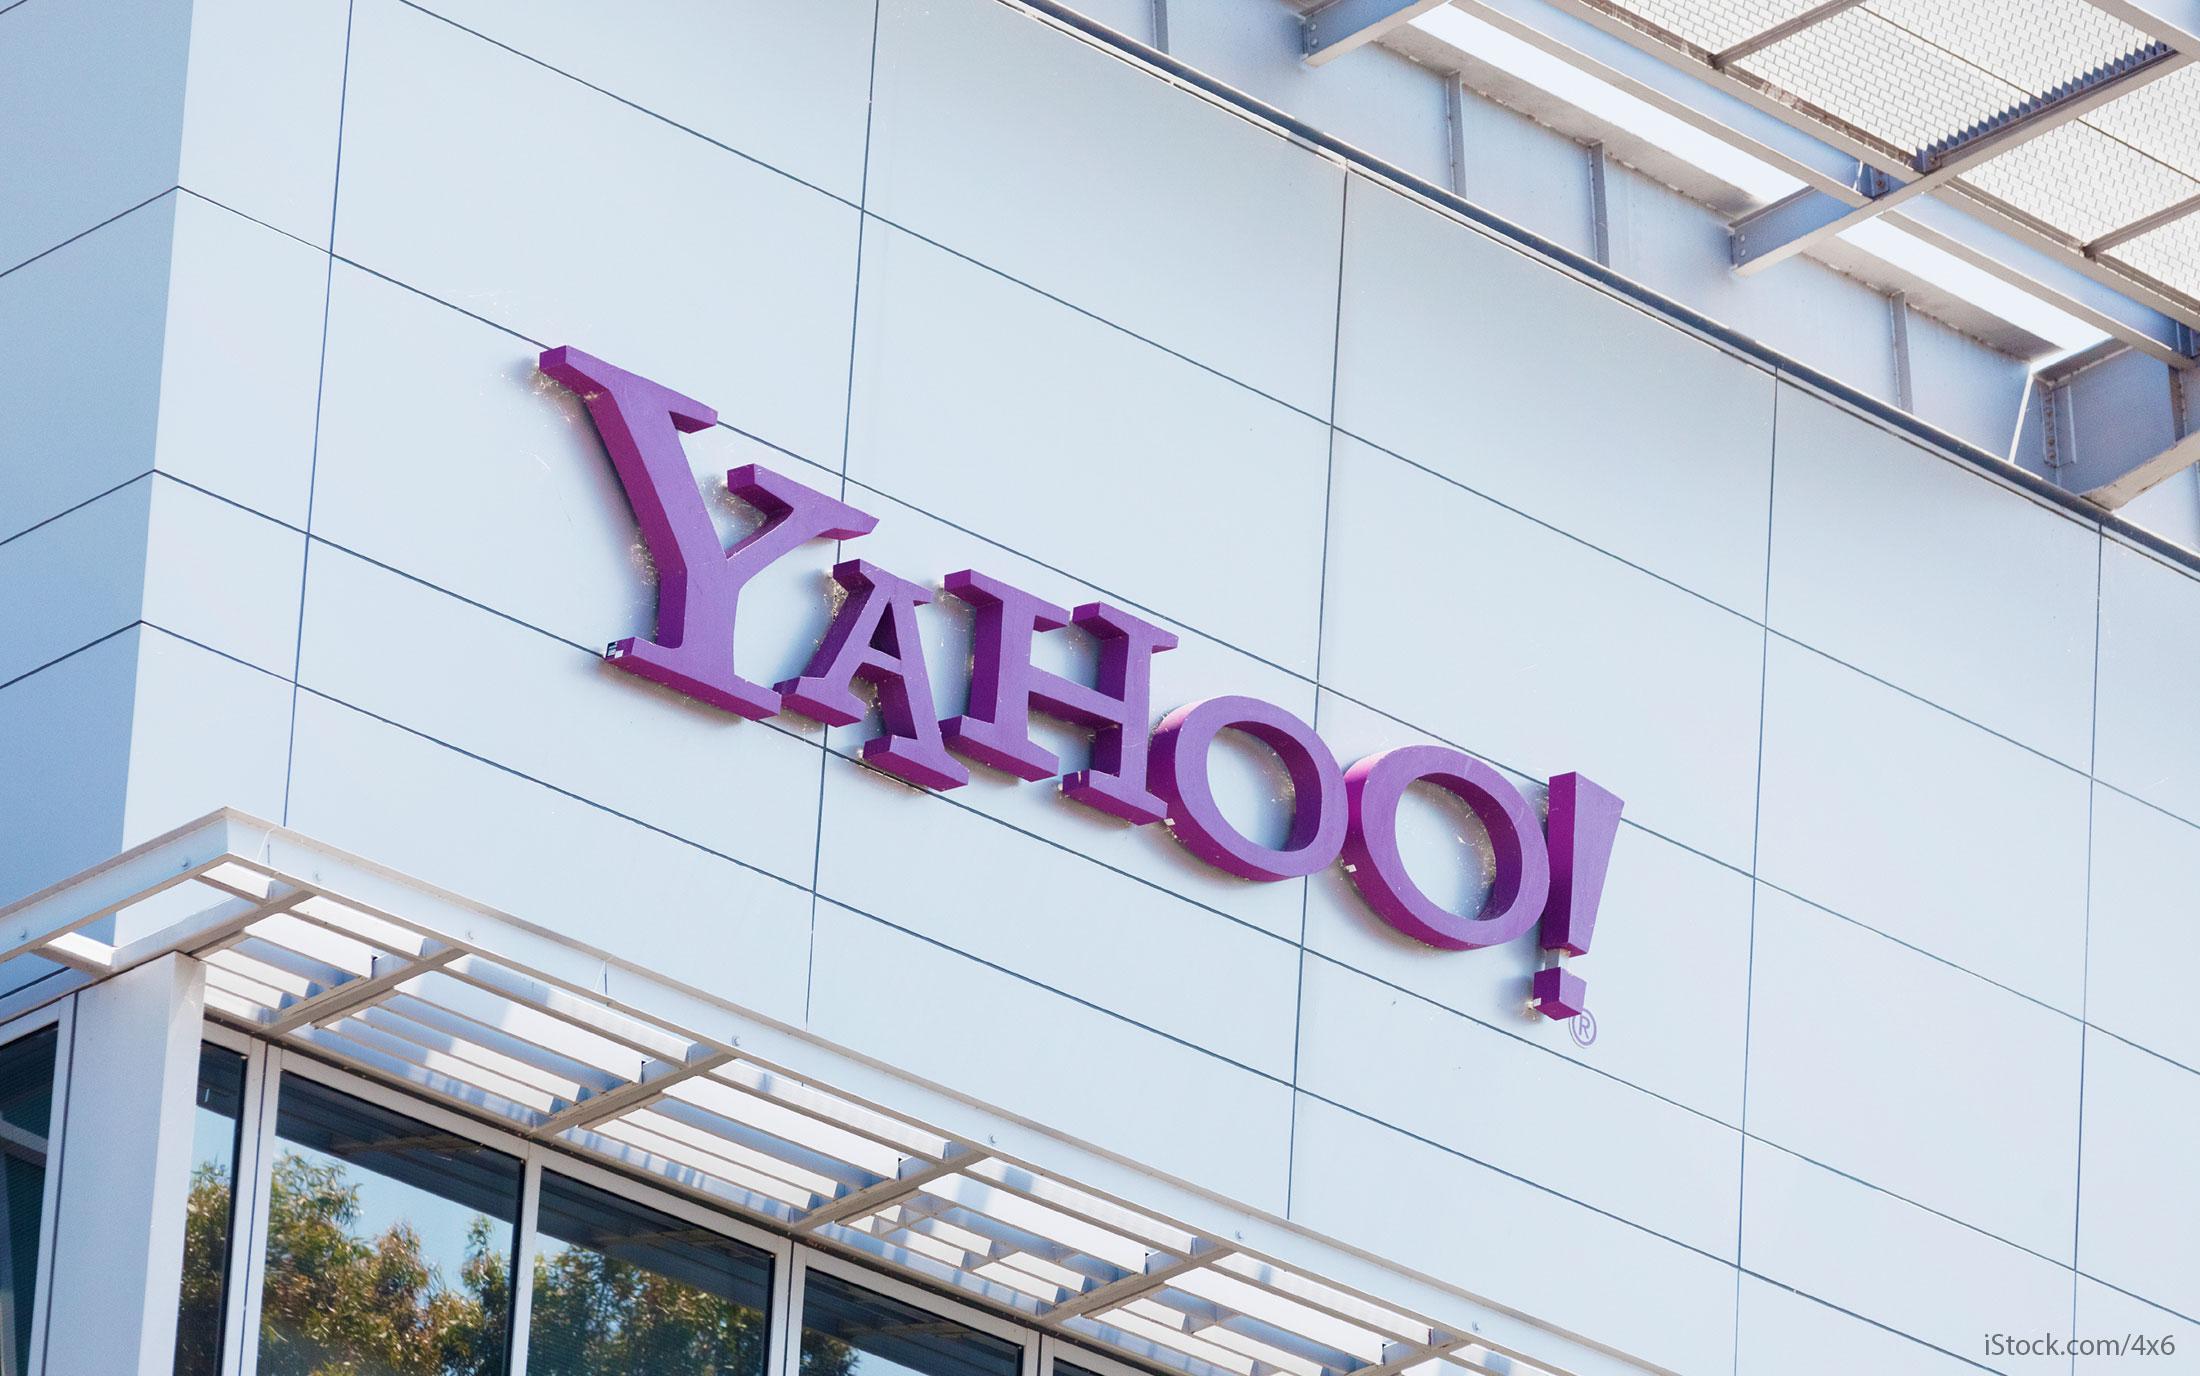 Yahoo sale